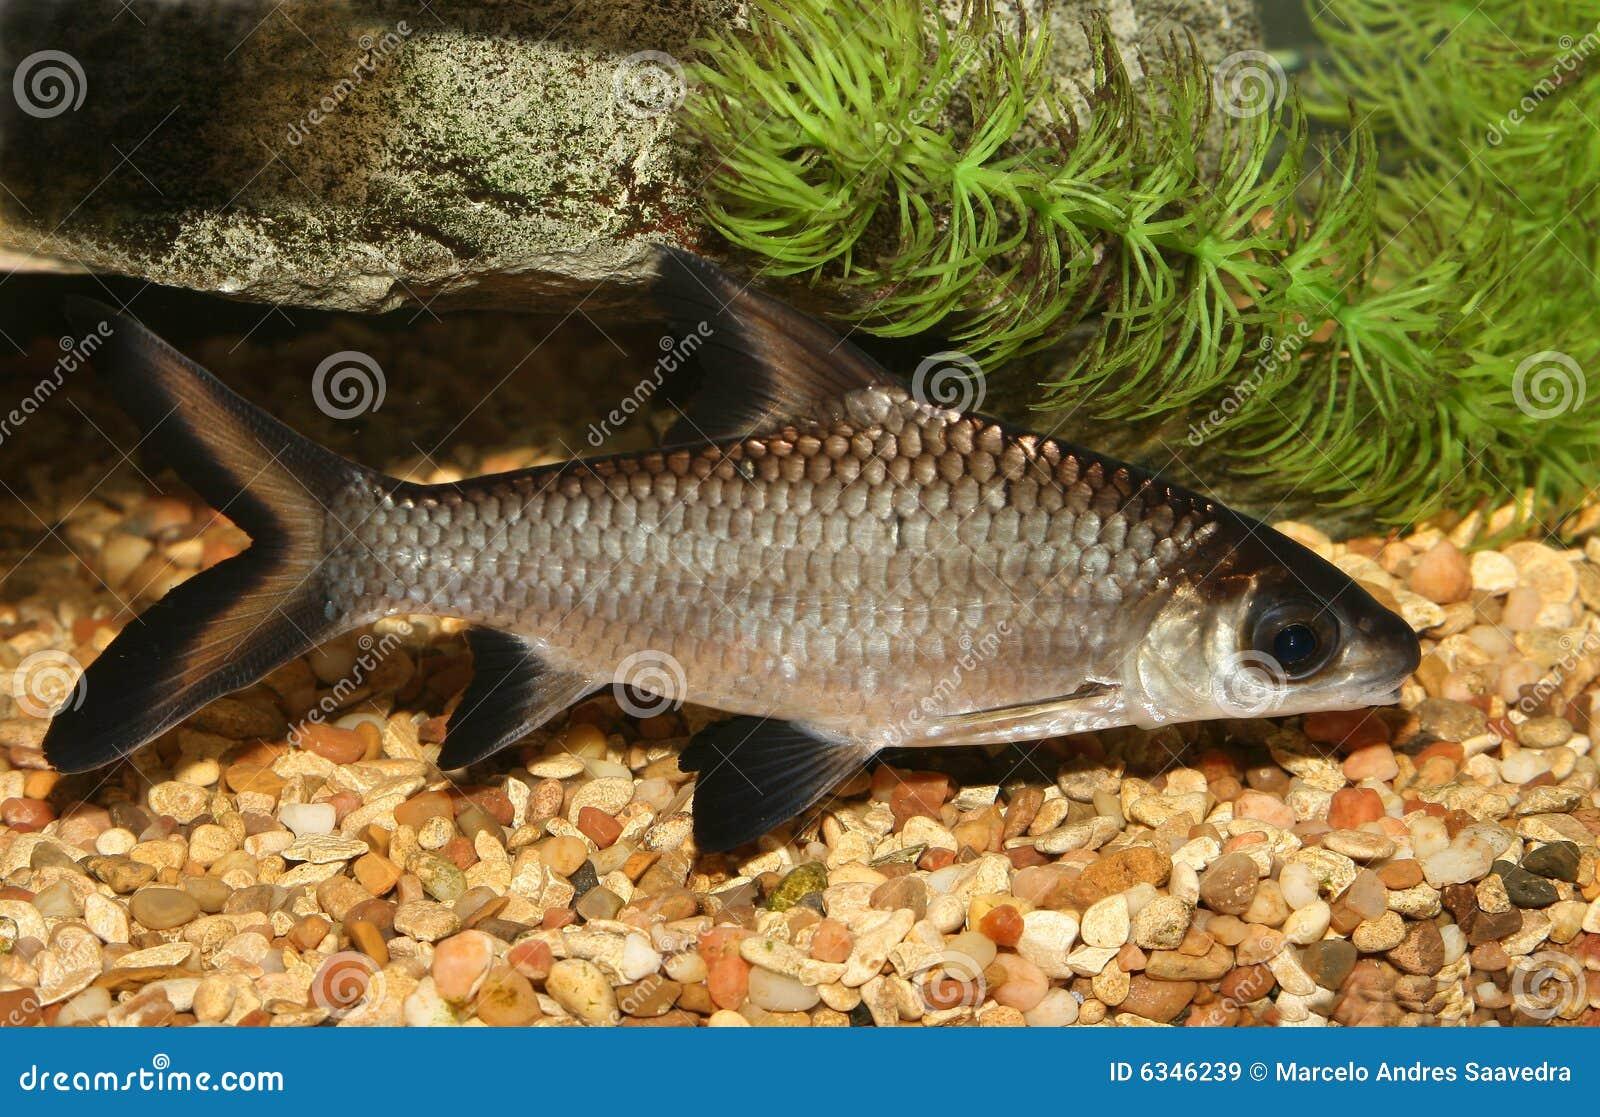 Bala Shark Fish Stock Image Image Of Fishtank Shark 6346239